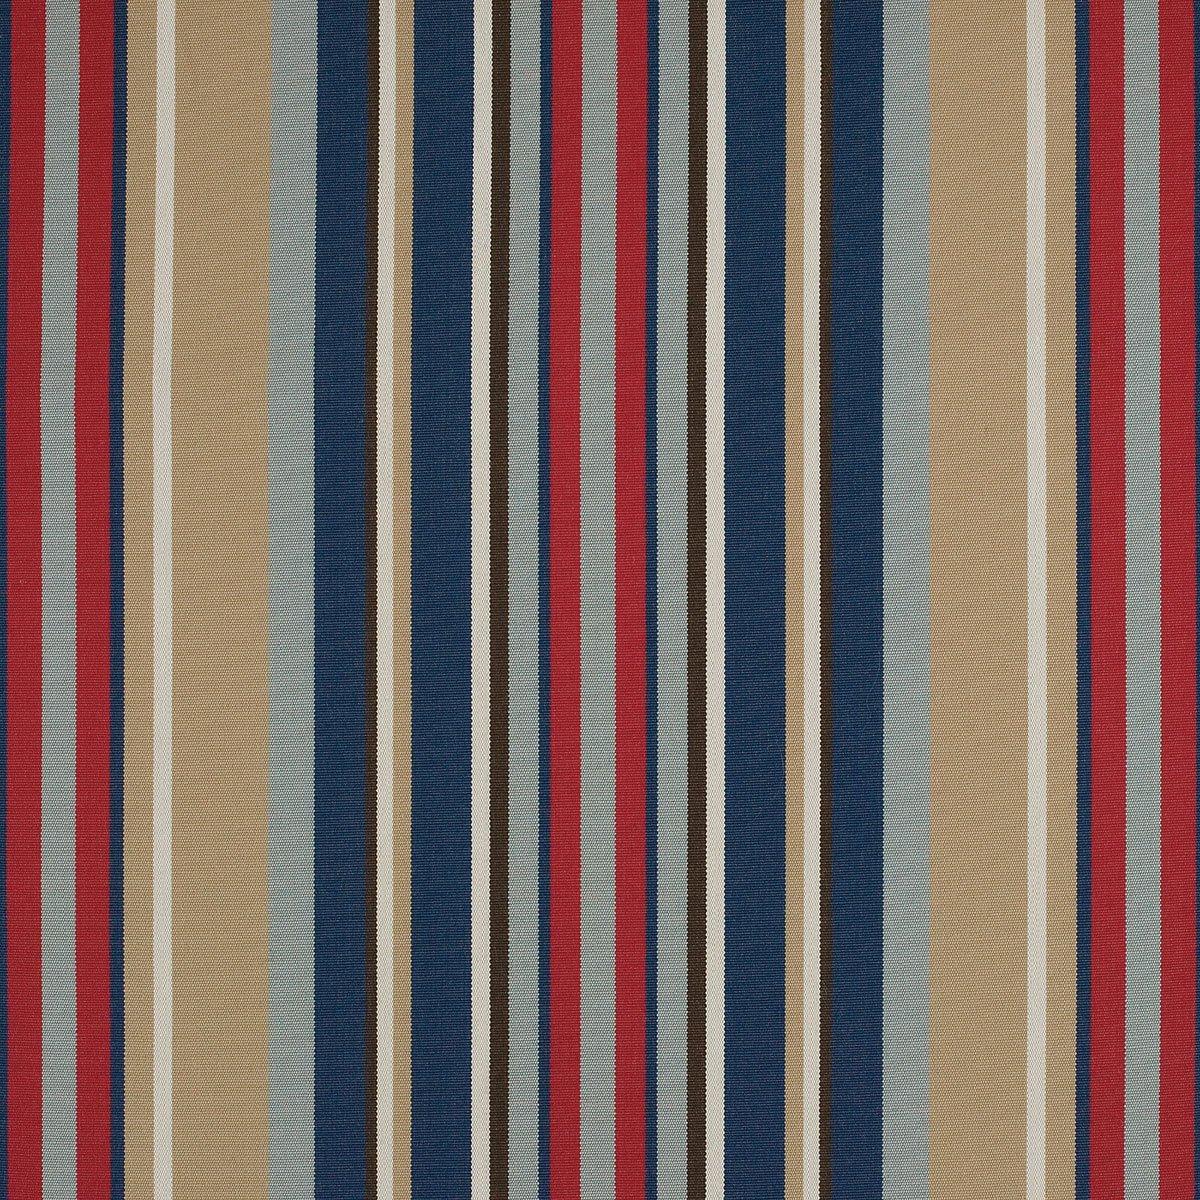 Outdura Fabric - Pursuit Blueridge #4754 by Outdura   B00P9ILIZE